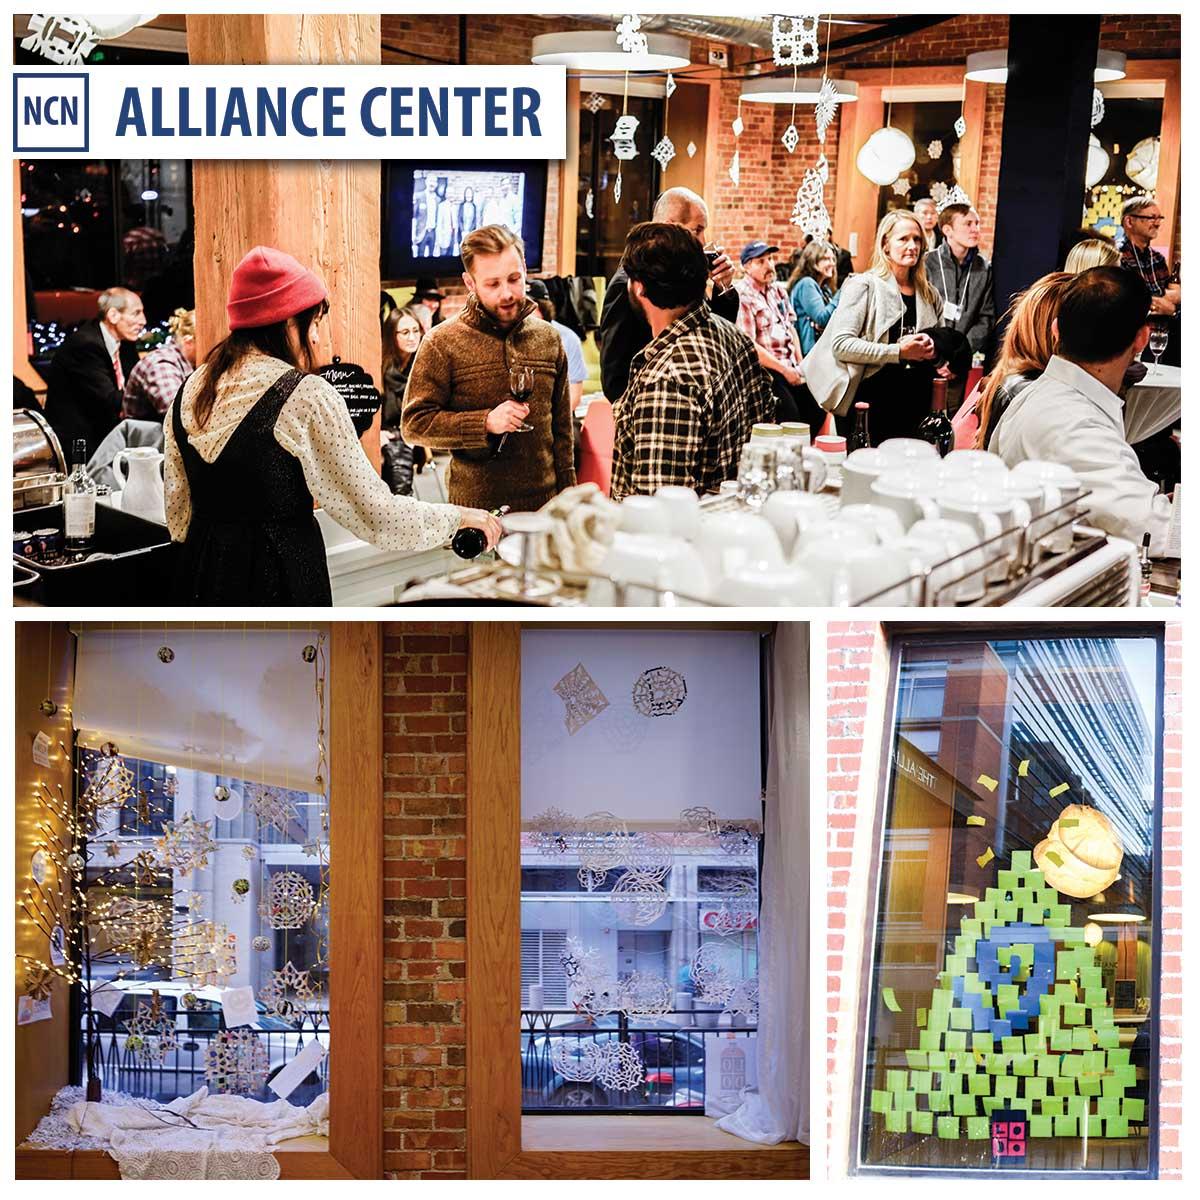 Alliance Center Holiday Decor